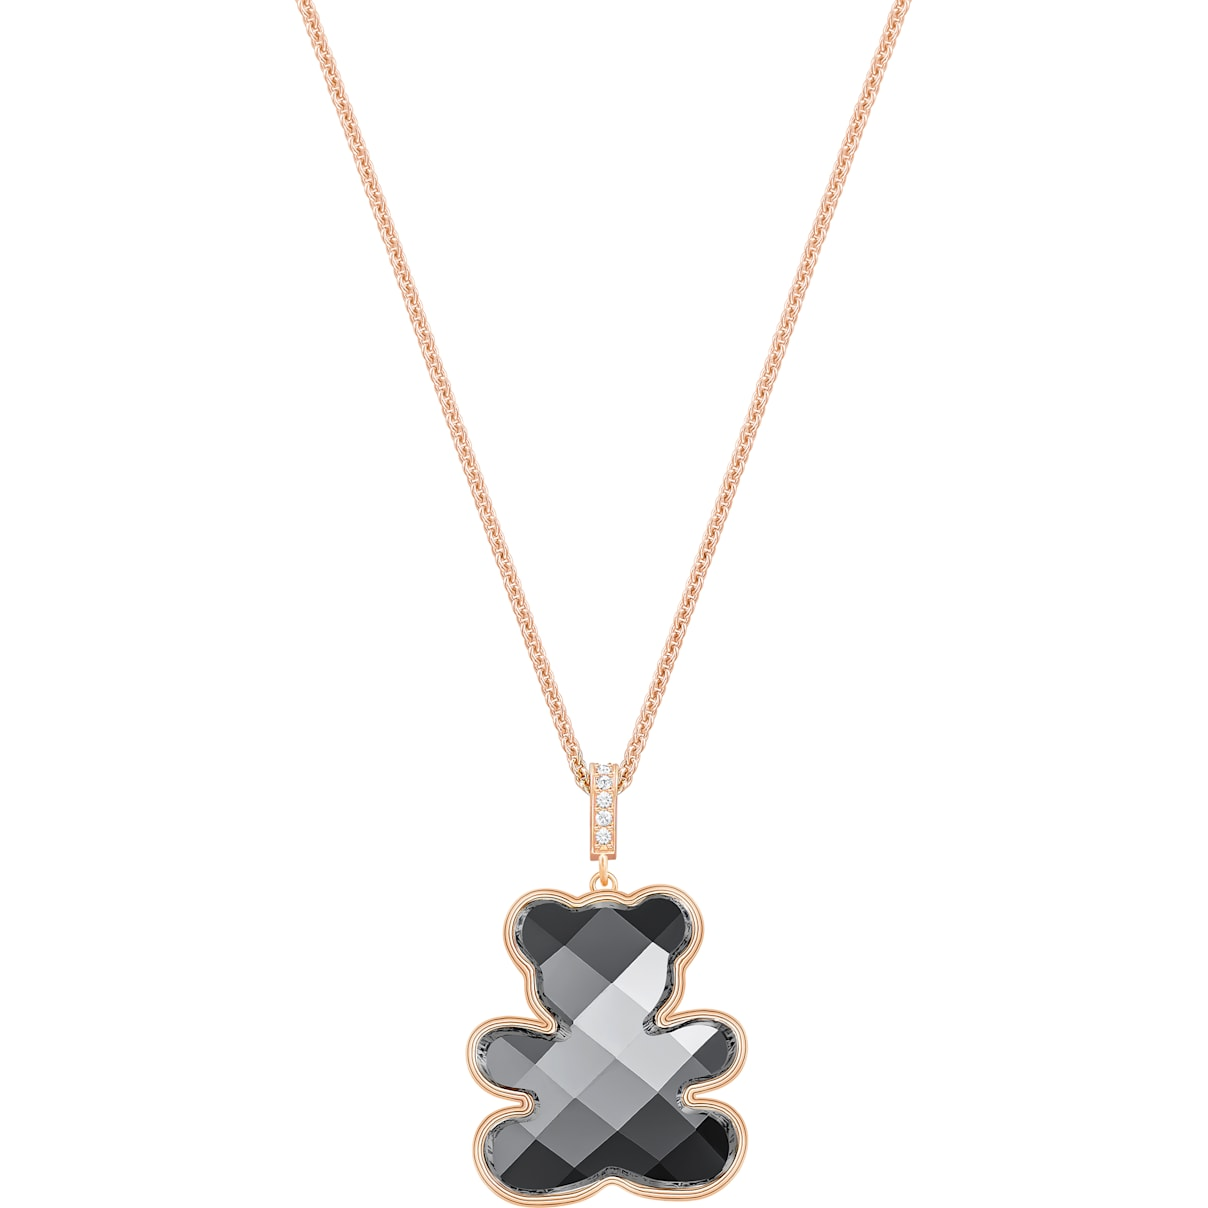 Swarovski Teddy Pendant, Black, Rose-gold tone plated